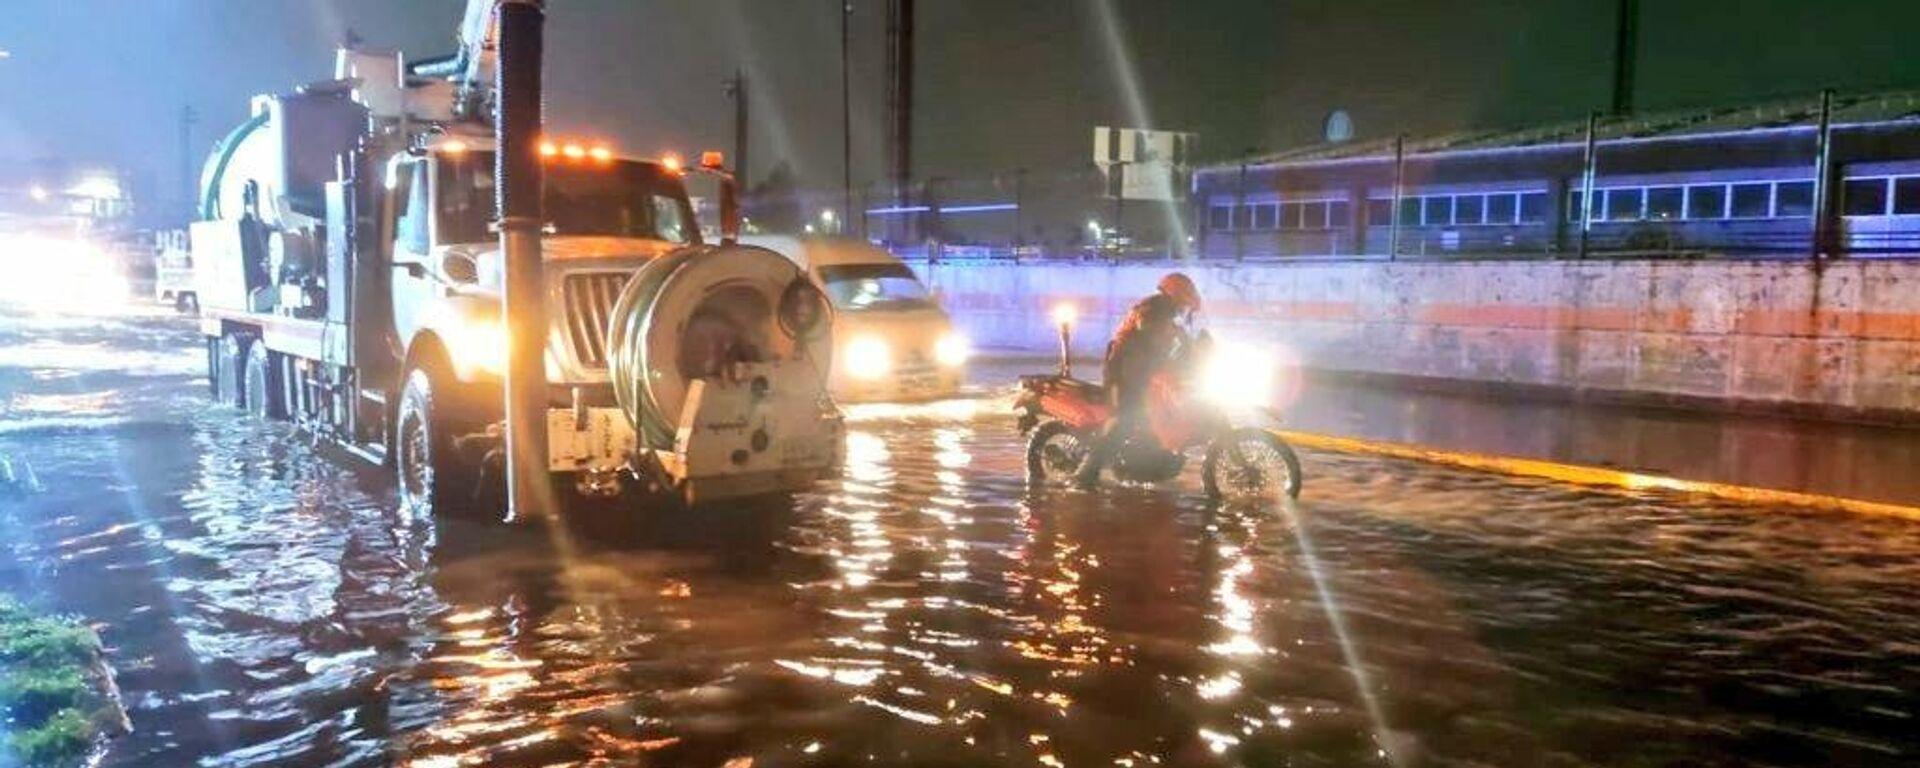 Inundaciones Ecatepec - Sputnik Mundo, 1920, 07.09.2021